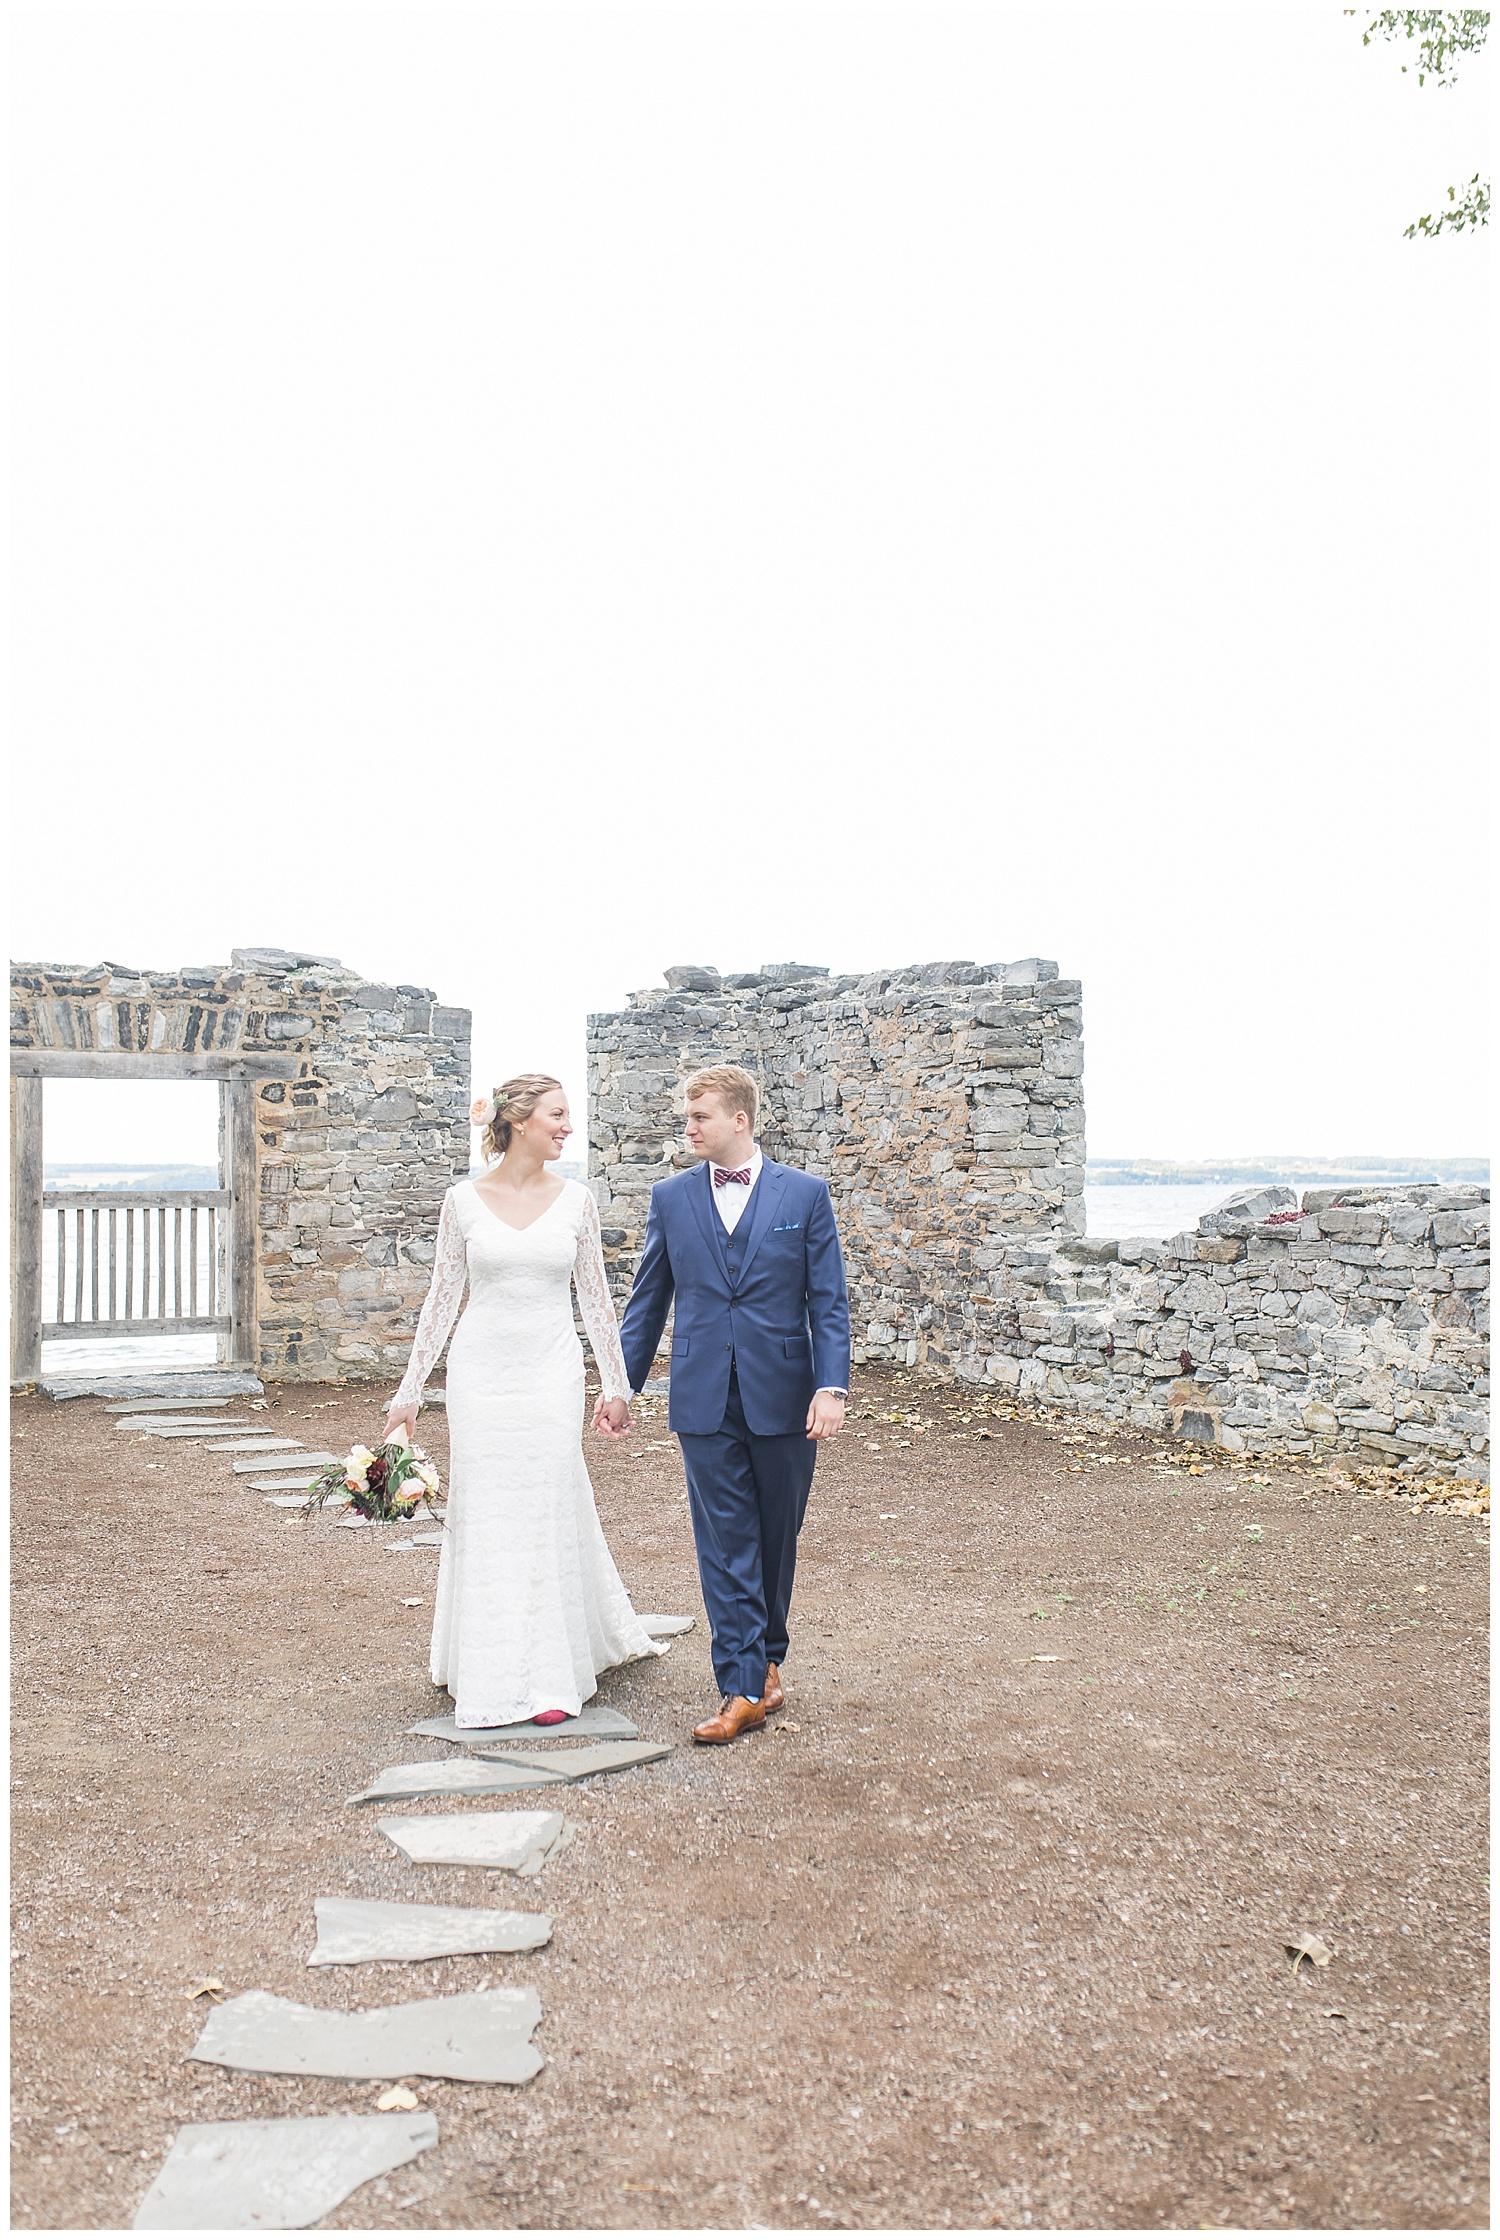 Margaret and Colin - Inns of Aurora - Lass and Beau-859_Buffalo wedding photography.jpg